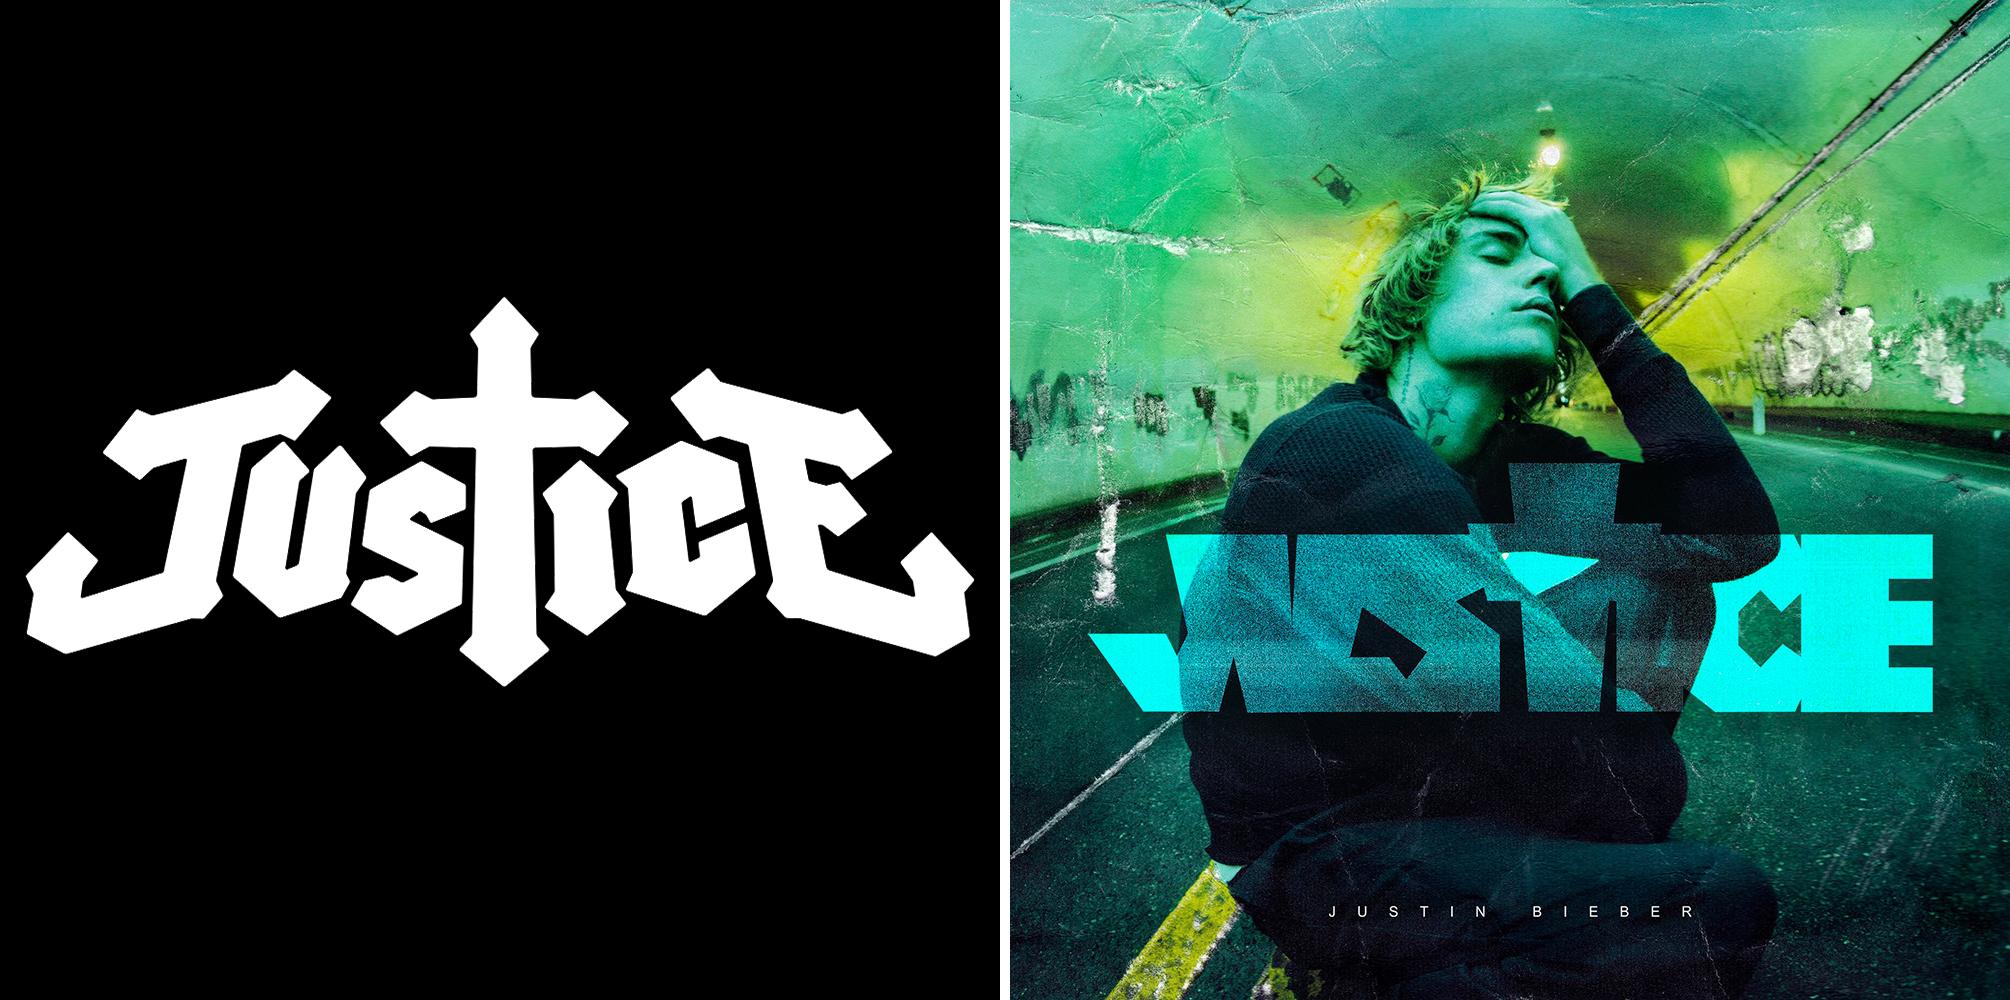 justice vs justin bieber justice album